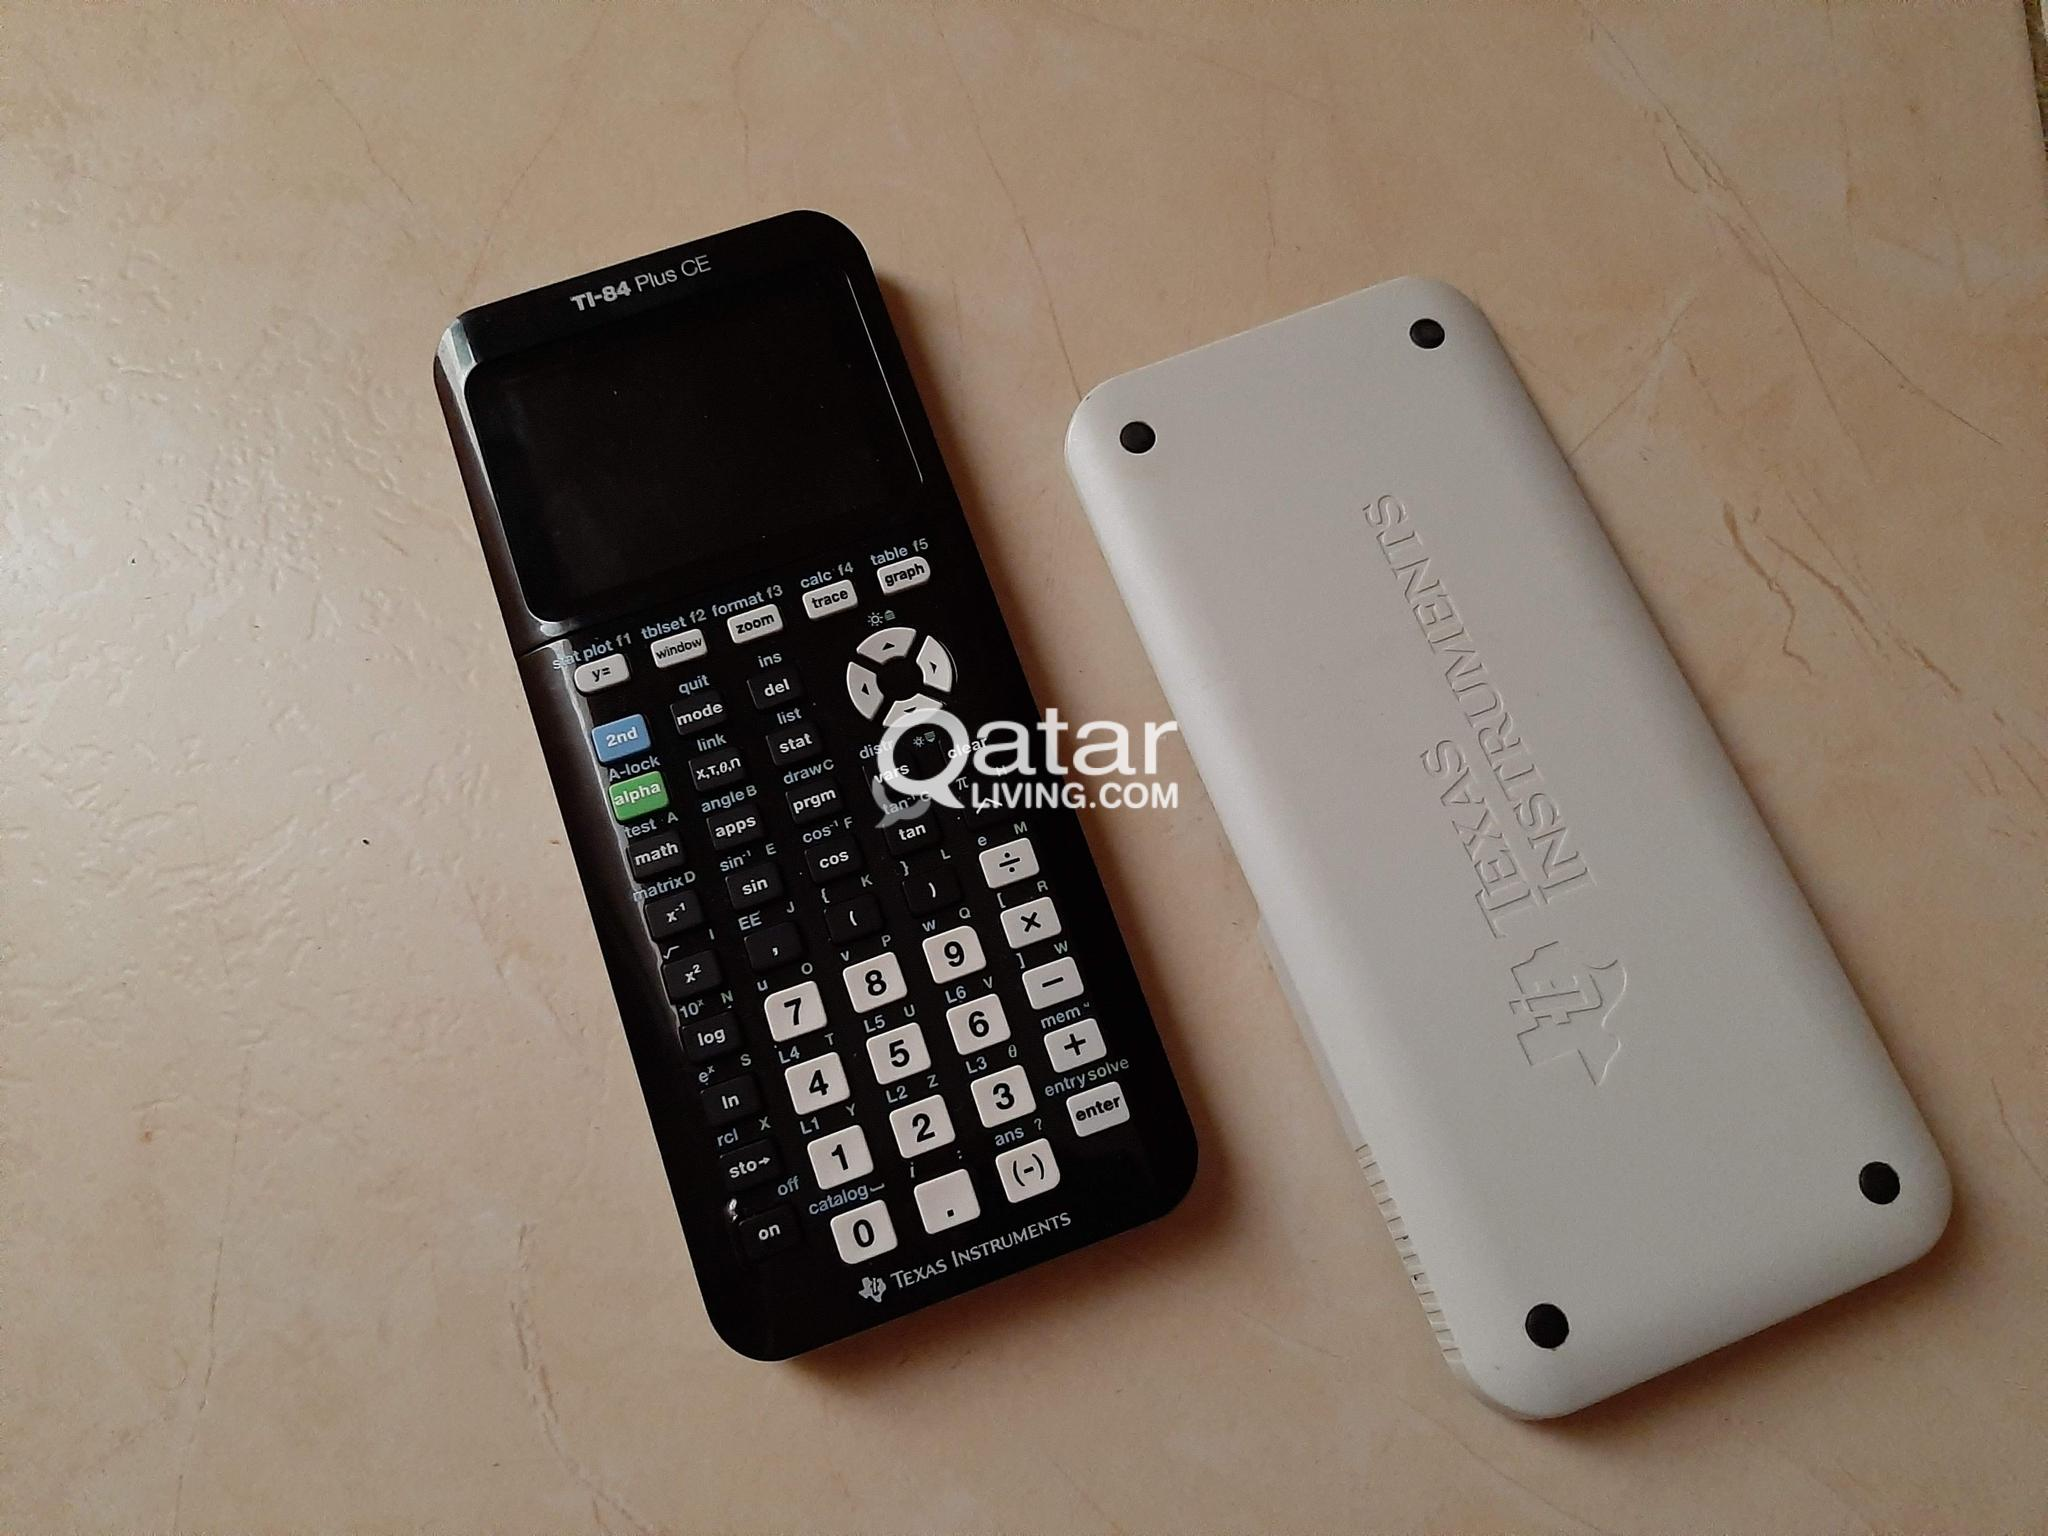 TI-84 Plus CE graphical calculator | Qatar Living